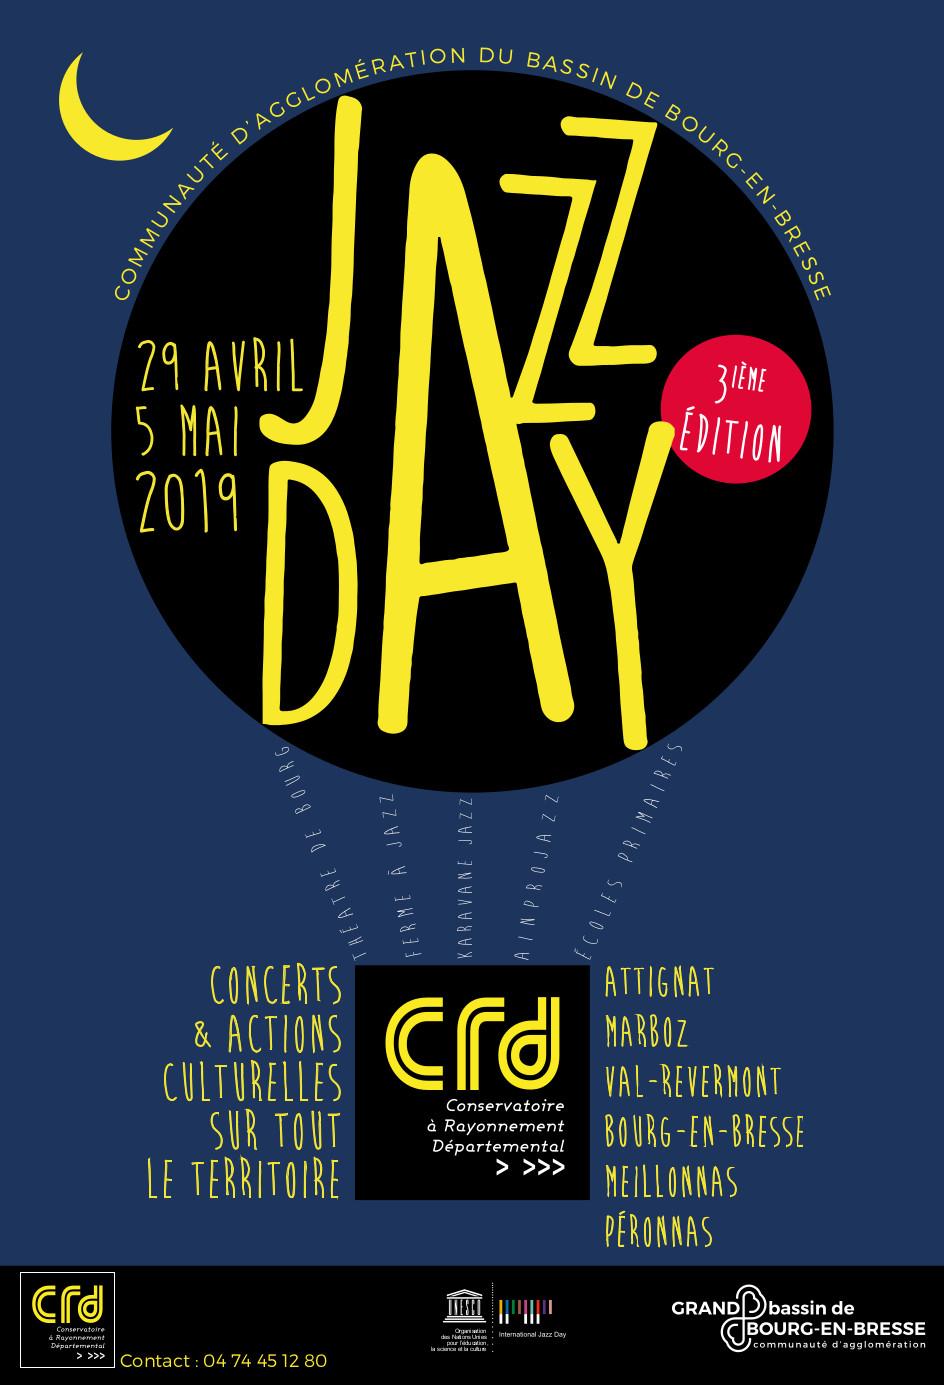 Jazz Day, 3ème édition